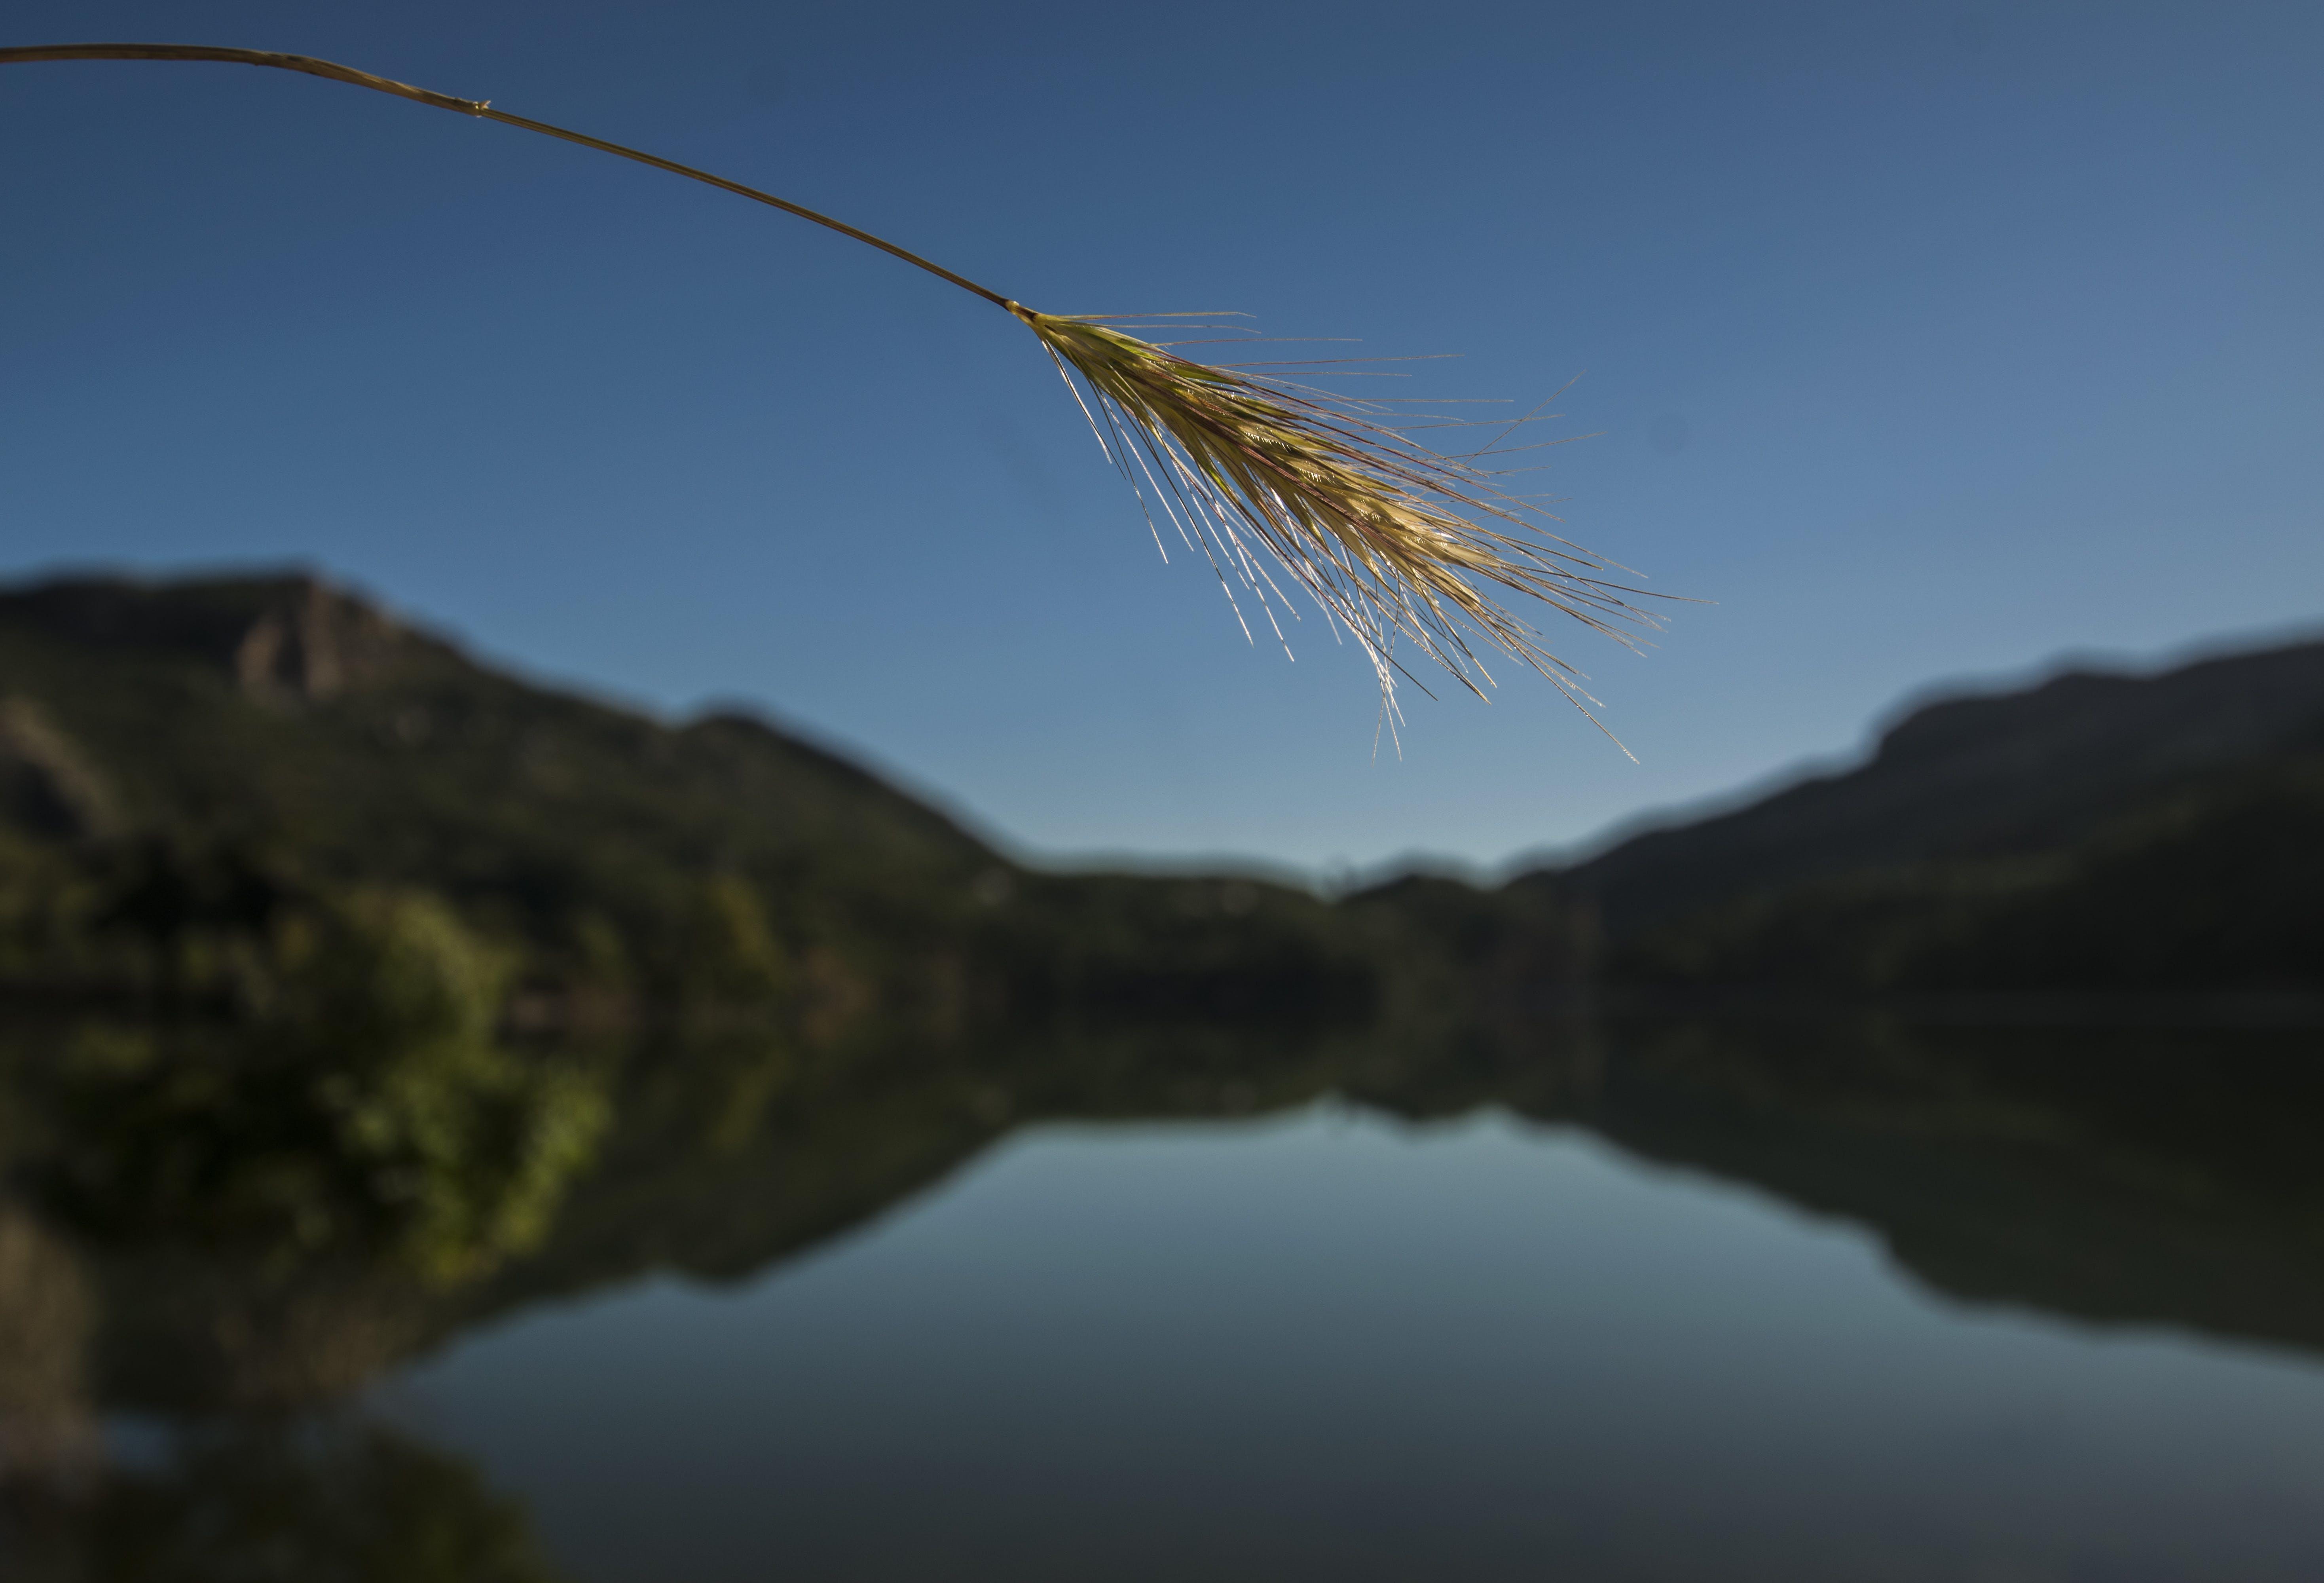 landscape, reflection, water